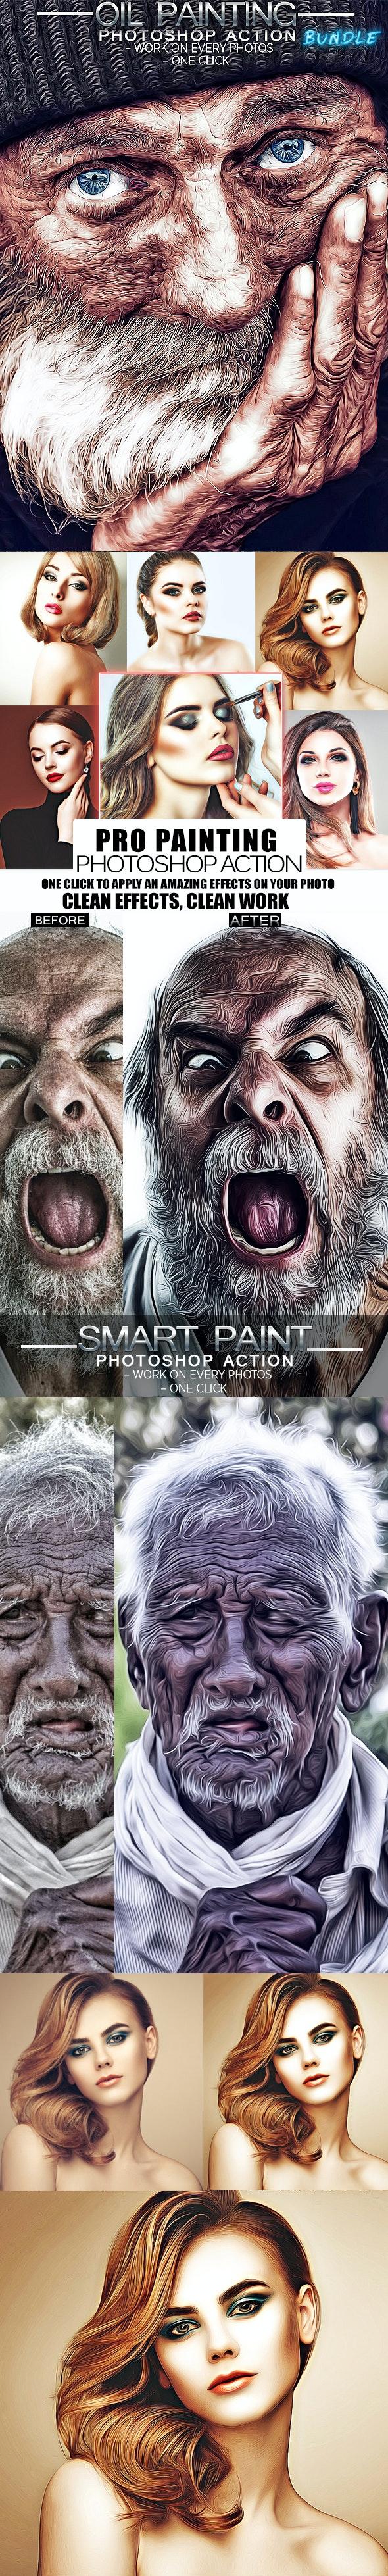 Oil Painting Bundle - Actions Photoshop